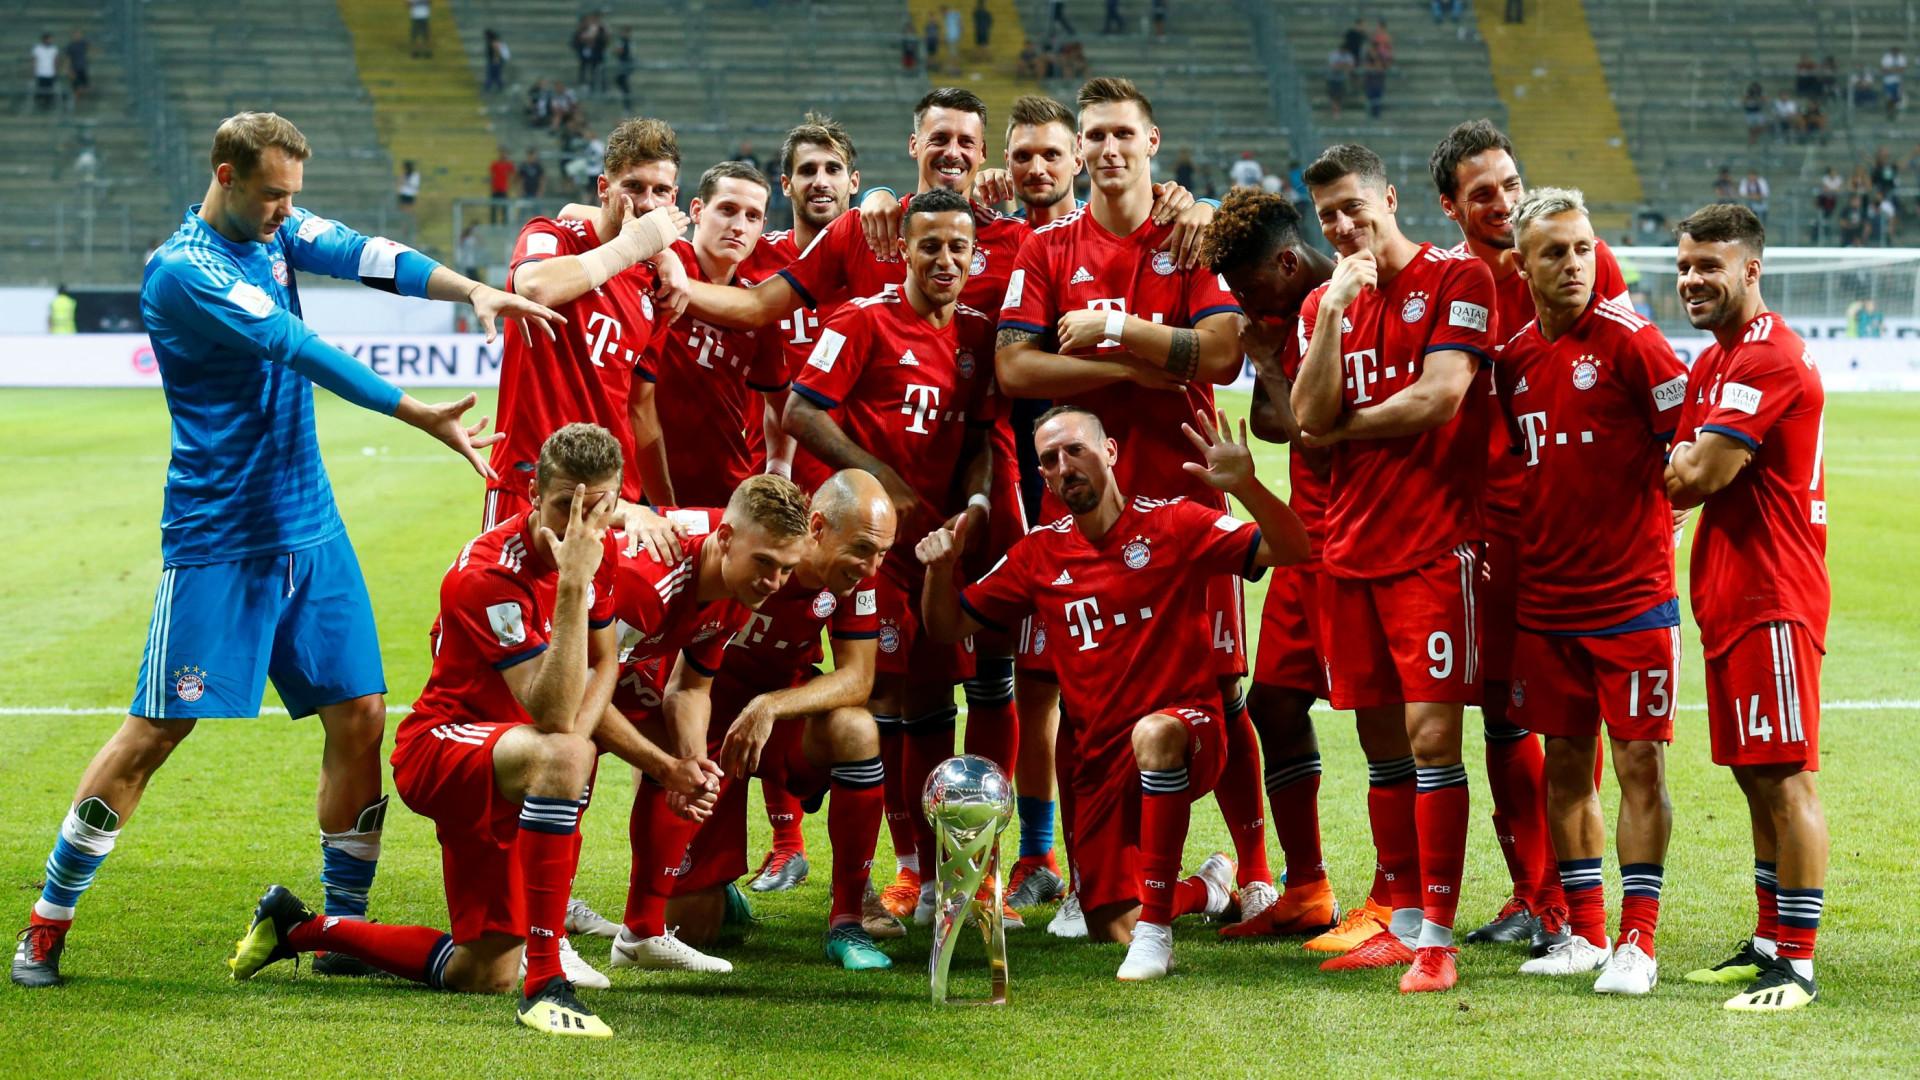 Bayern 'cilindra' Eintracht e conquista terceira Supertaça consecutiva